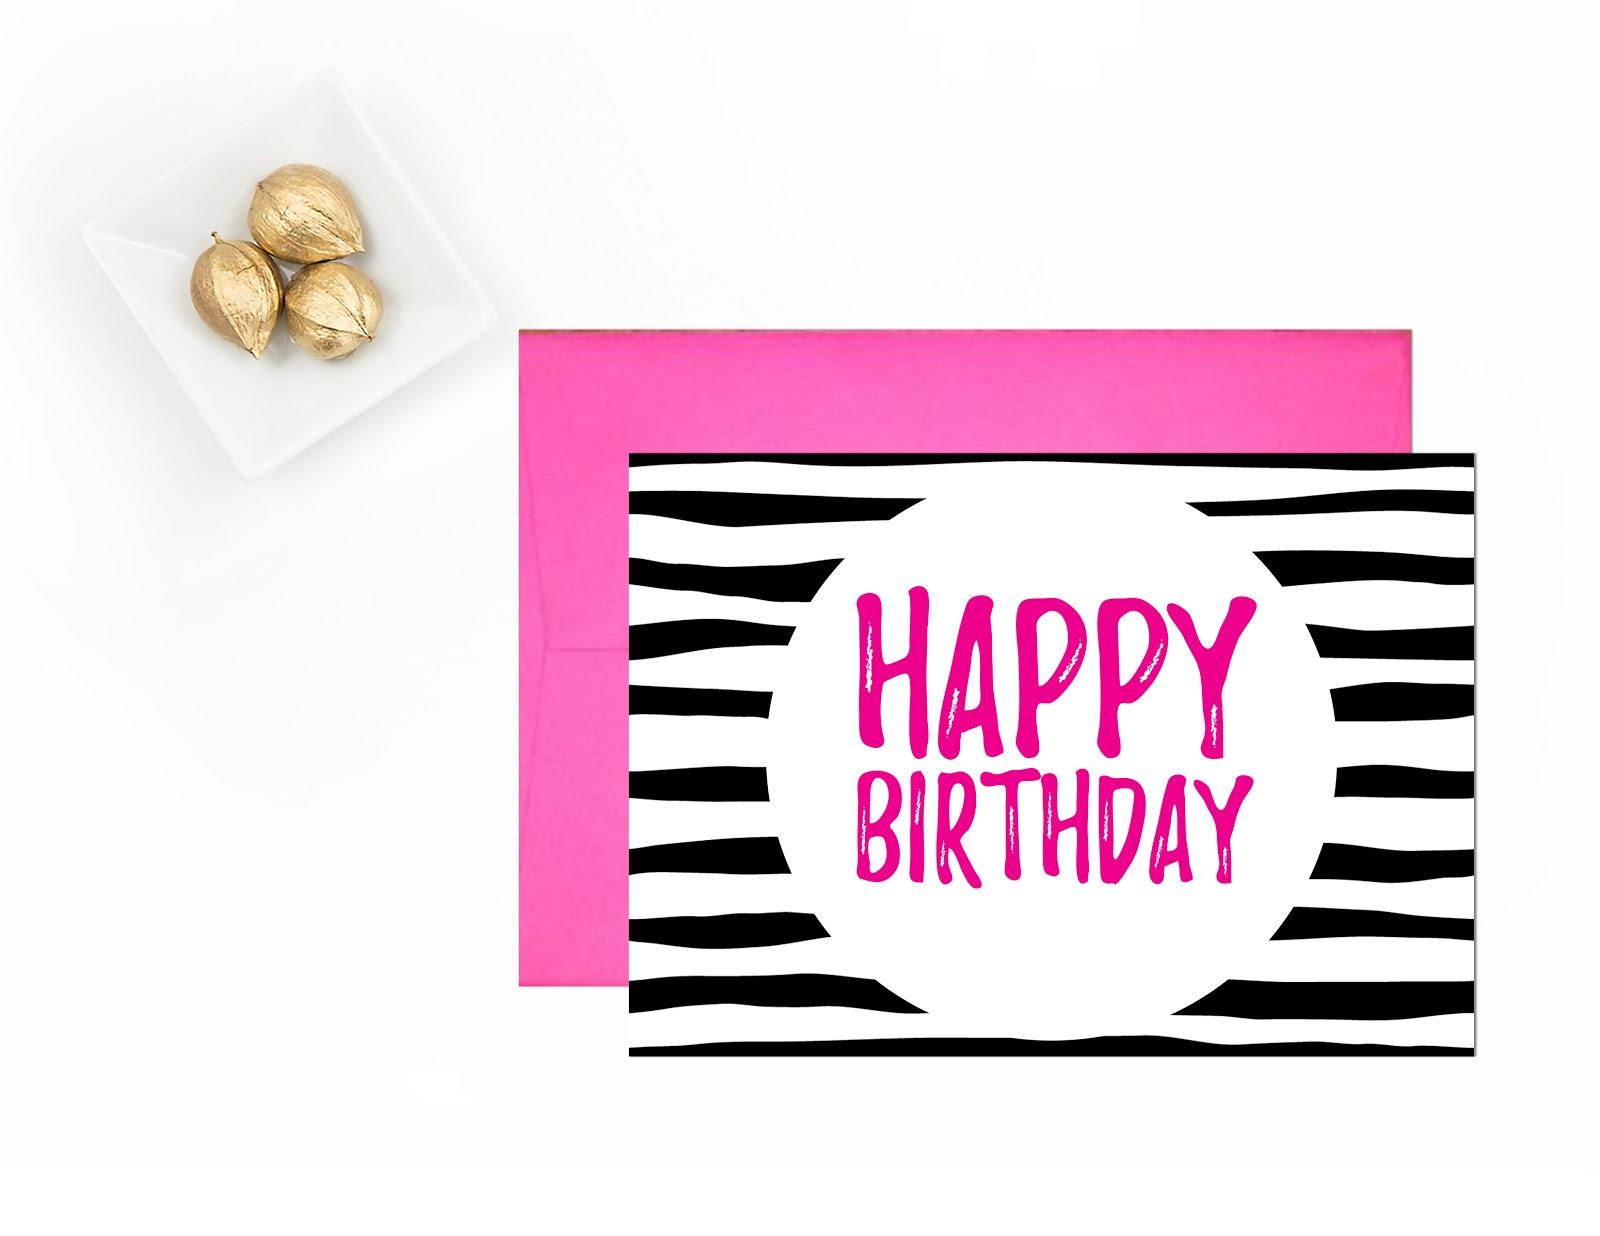 Happy Birthday | Free Printable Greeting Cards - Andree In Wonderland - Free Printable Bday Cards